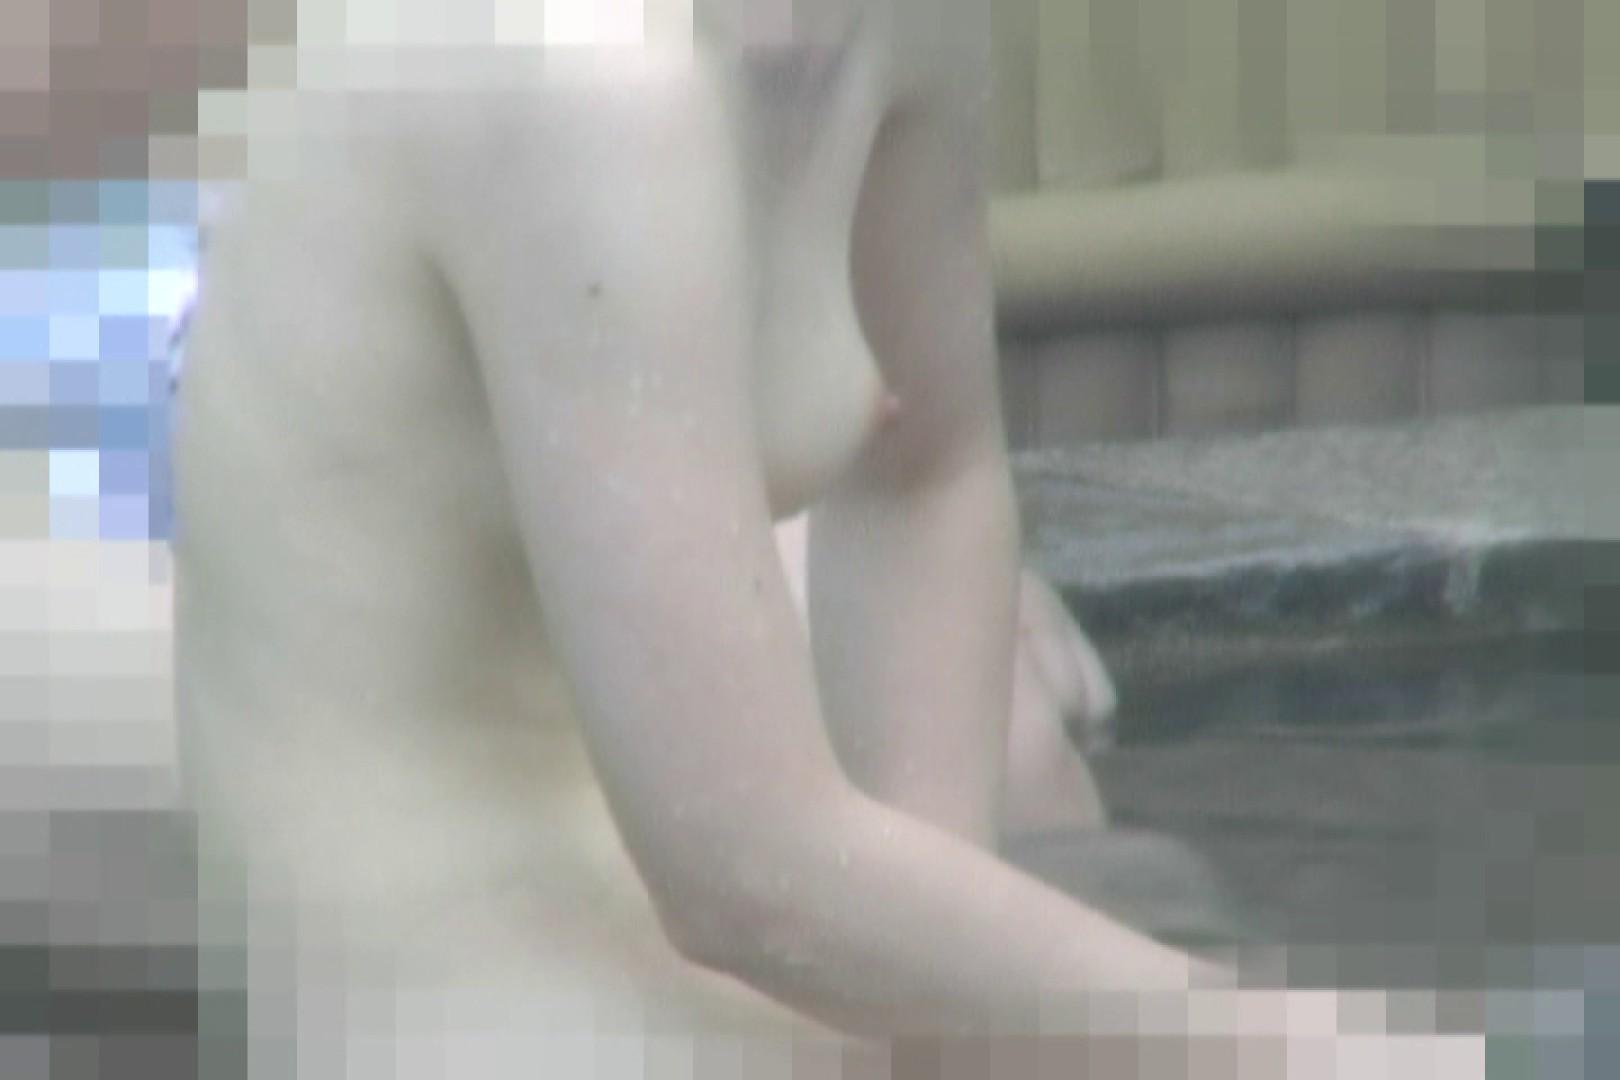 Aquaな露天風呂Vol.835 盗撮 | HなOL  73pic 53